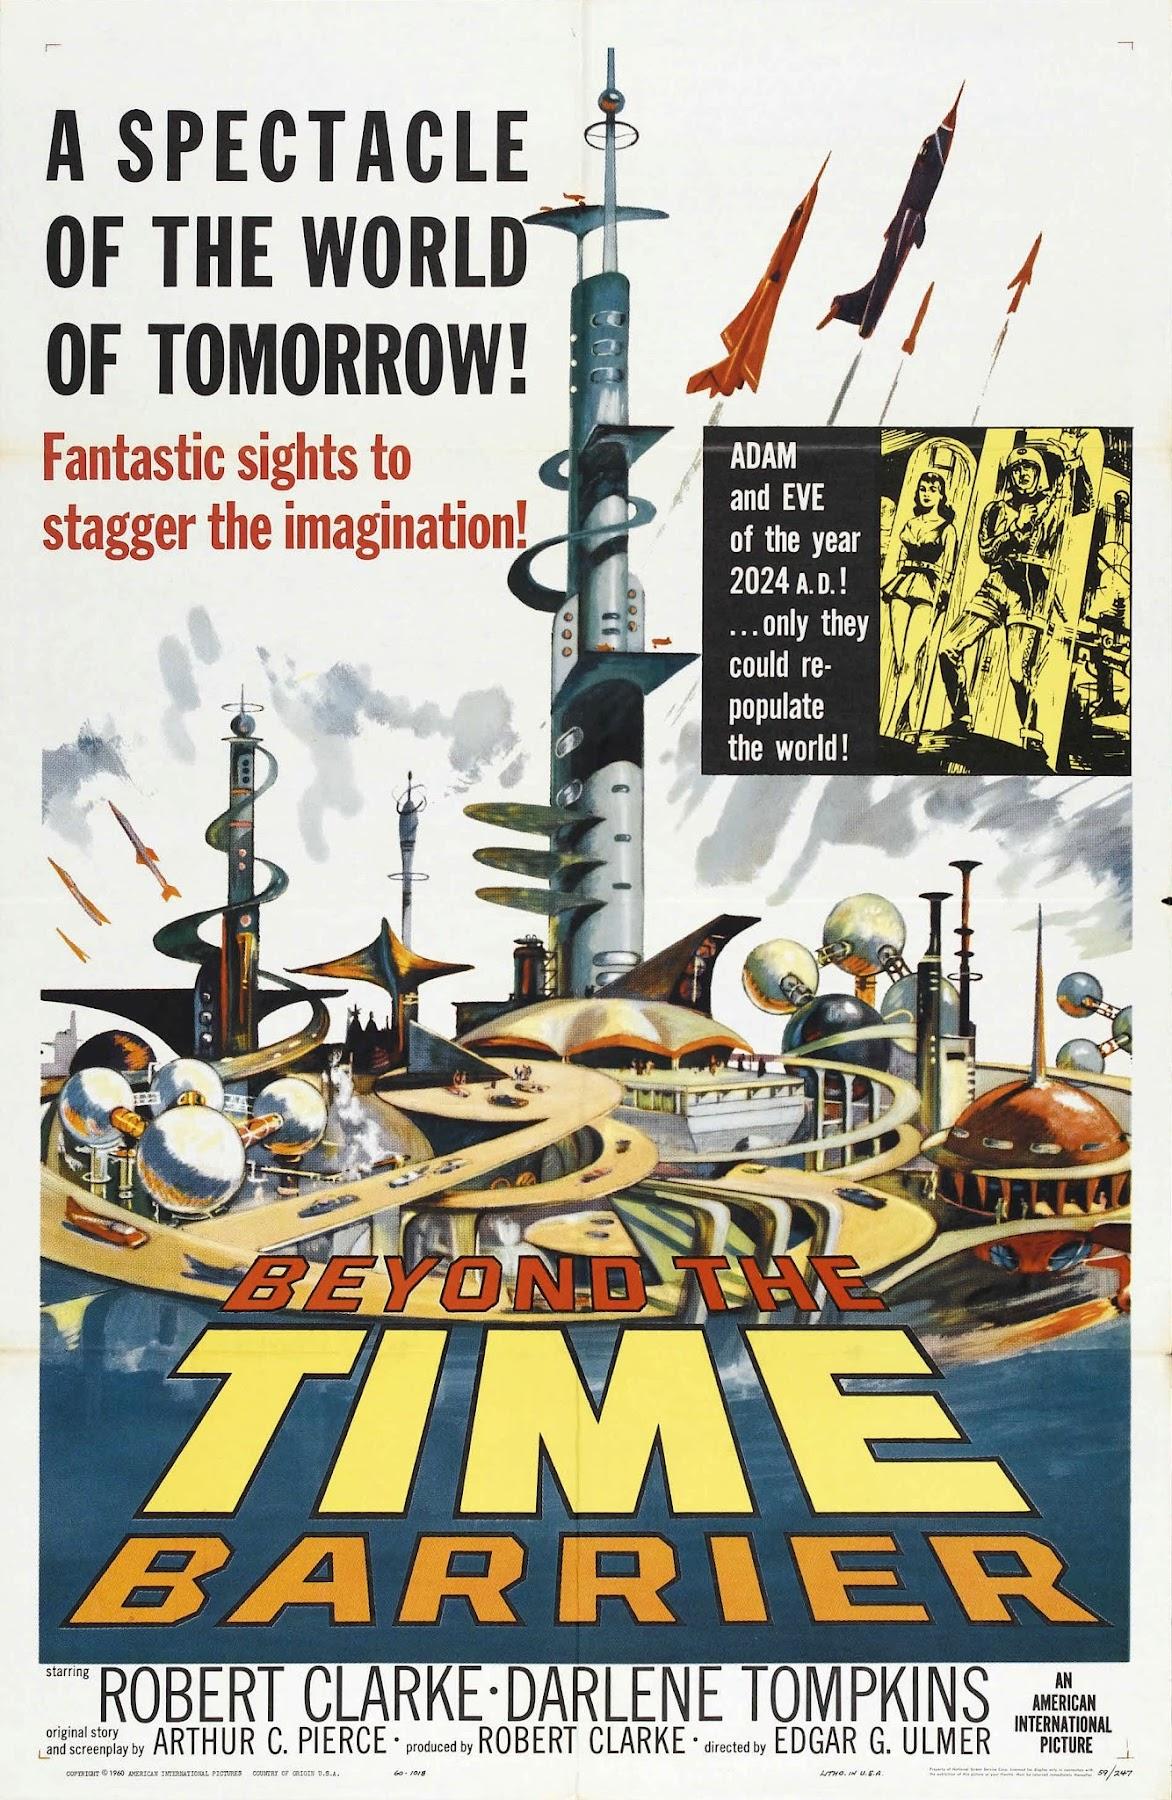 http://4.bp.blogspot.com/-mzk1BJLRorI/UdruRWNkODI/AAAAAAAAA-A/YrMOFU3QvG8/s1800/beyond_the_time_barrier_poster_01.jpg